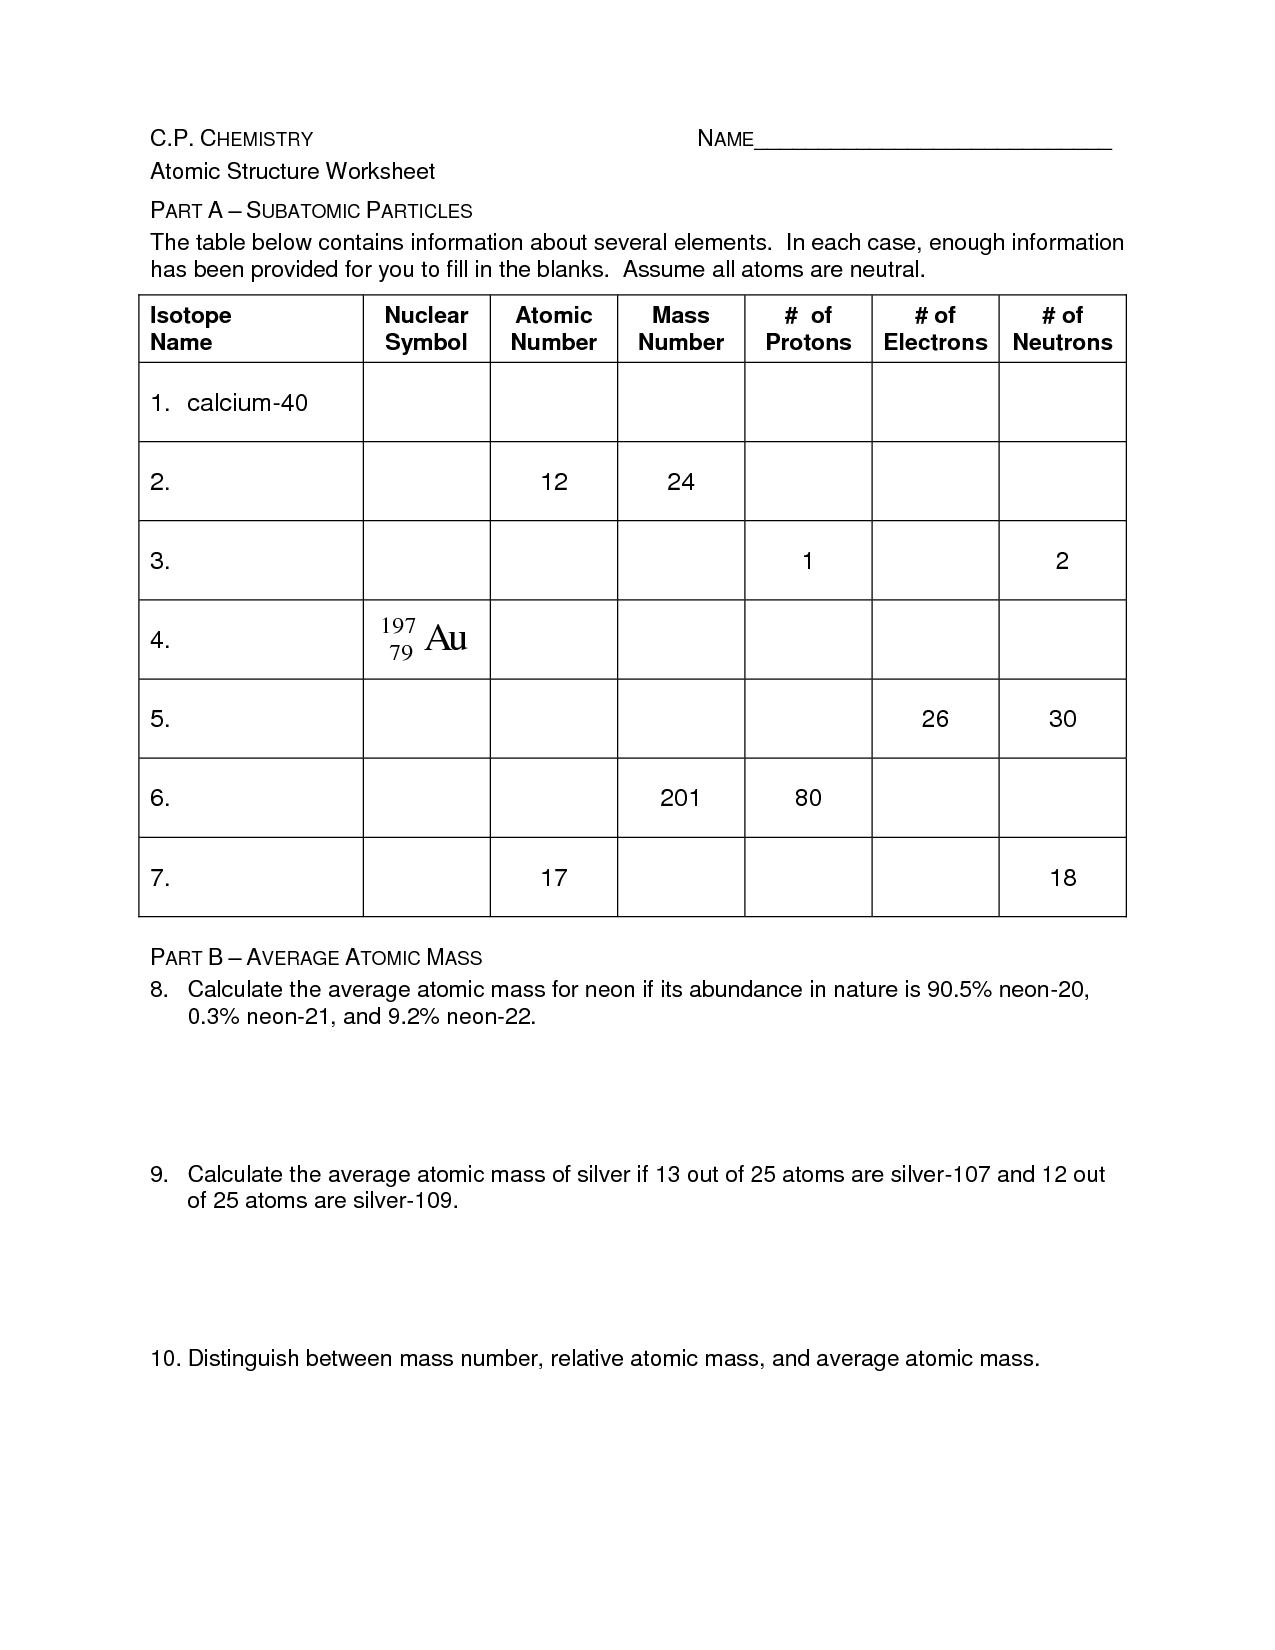 Basic Atomic Structure Worksheet Answers